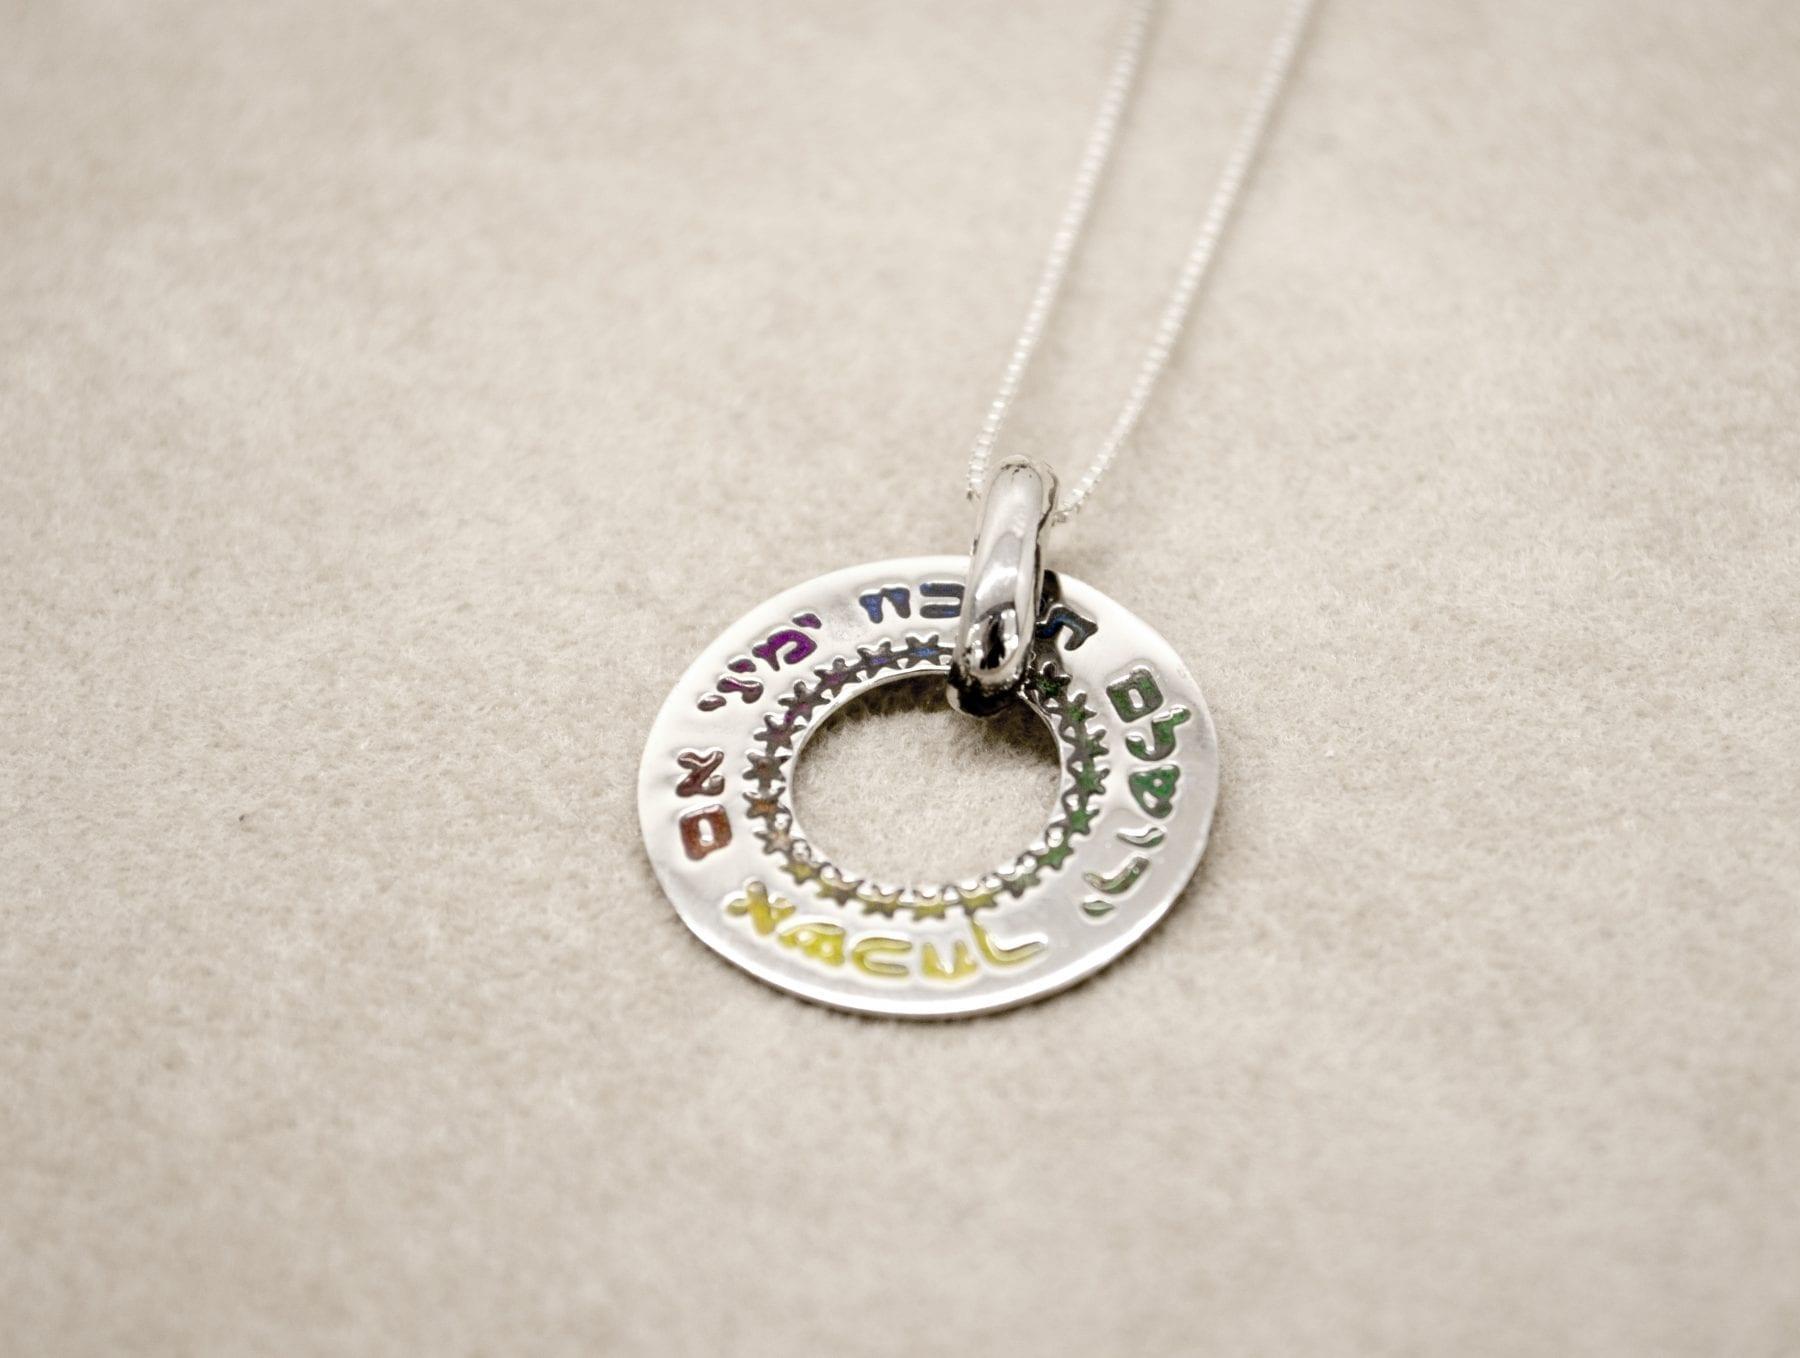 Multicolored Sterling Silver Im Eshkachech Yerushalayim Necklace